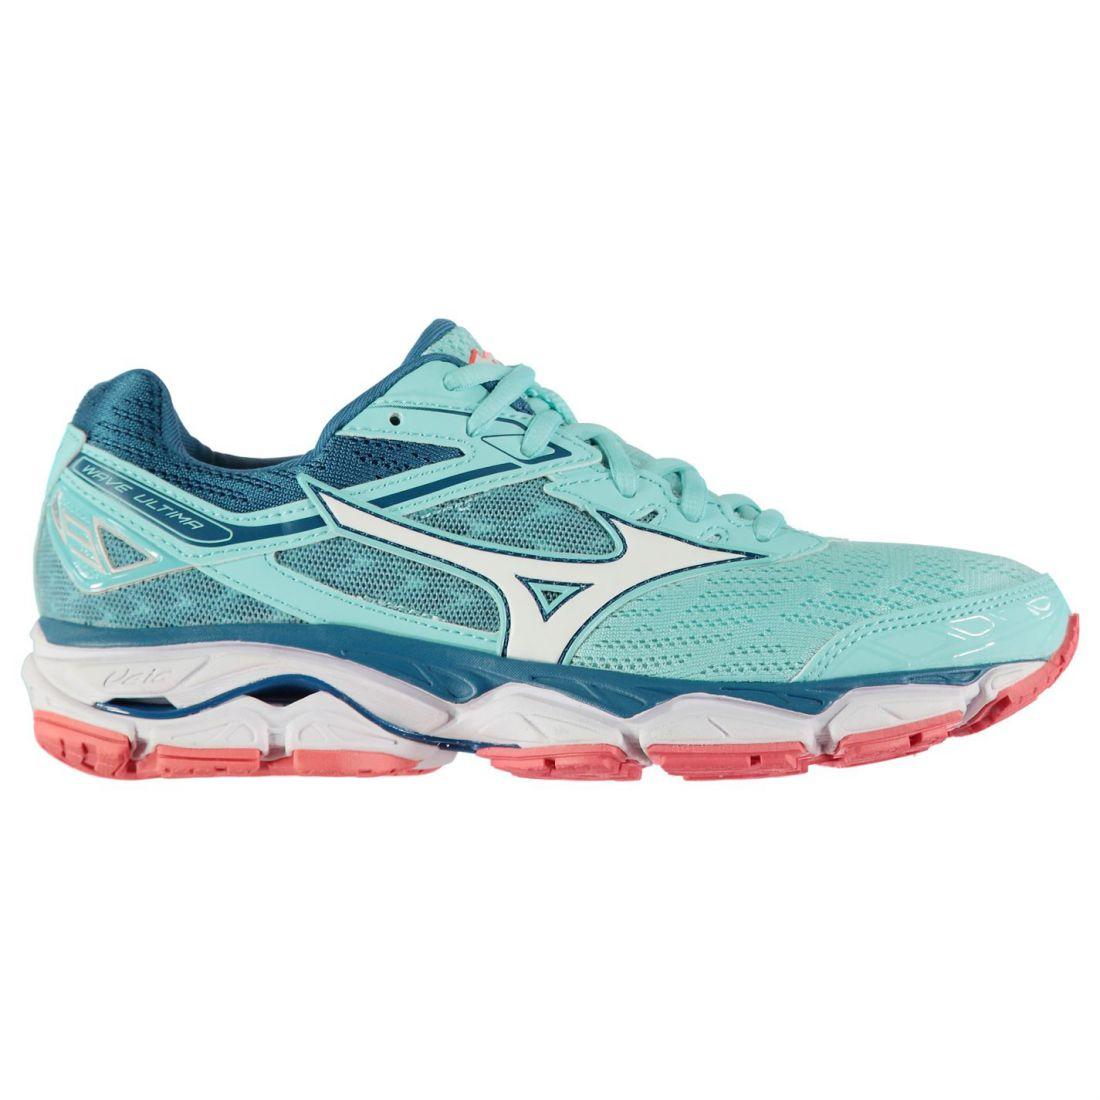 Mizuno Wave Ultima 9 Running shoes Ladies Road